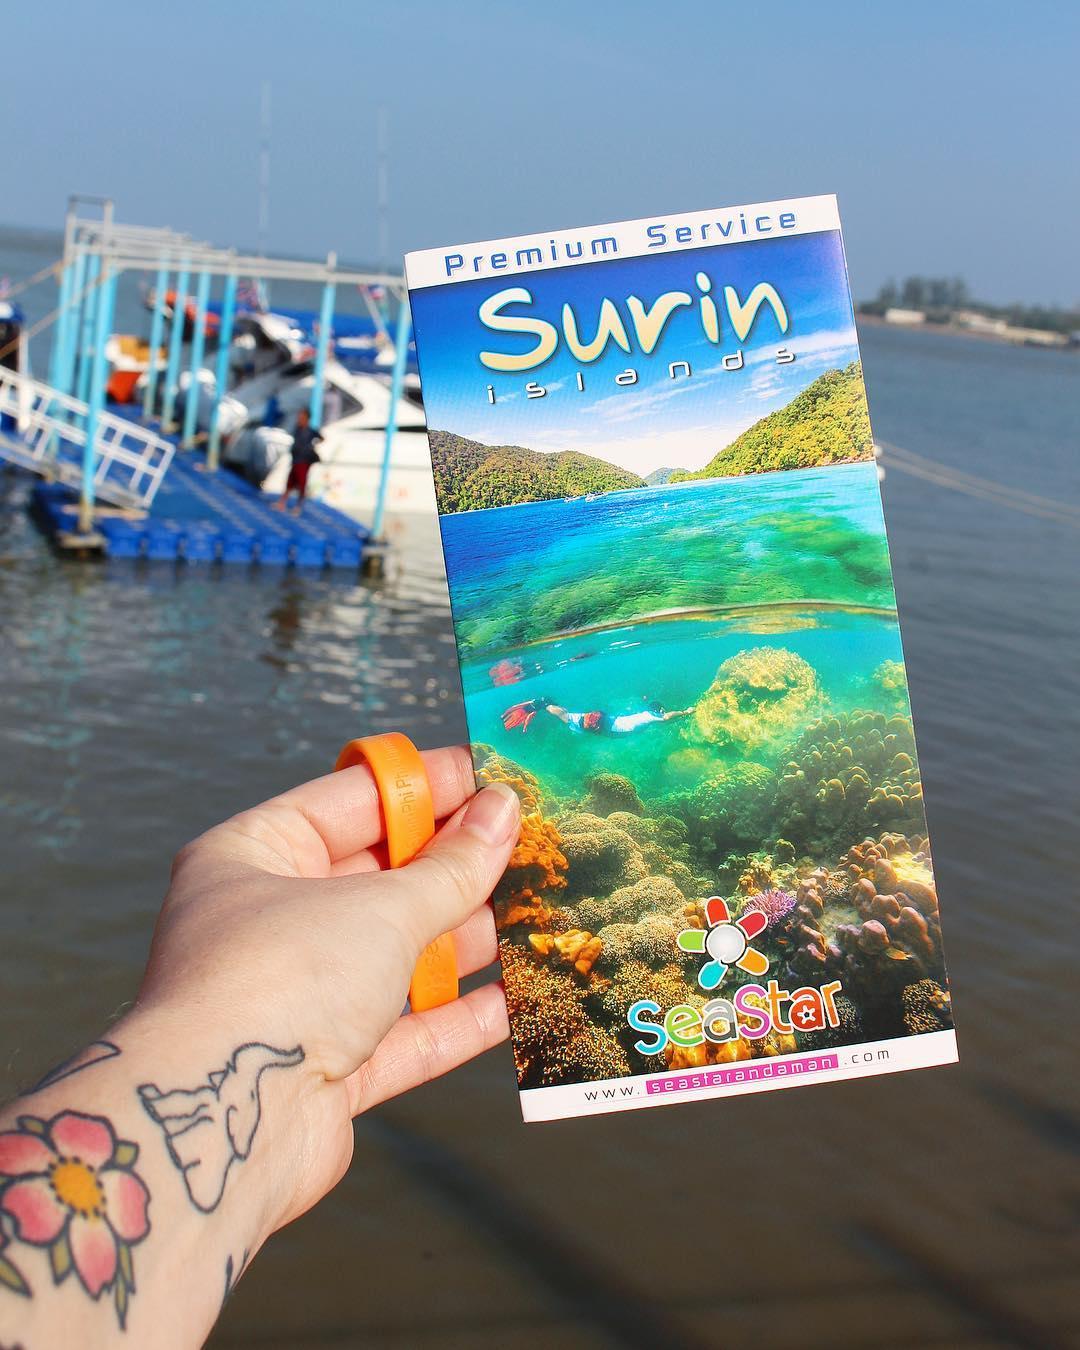 C'est parti baby ! Snorkeling ???♀️????? . . ⛴______ ➕ l  Les îles SURIN . ? | Khao Lak • Côte Ouest Thaïlande . ? | #PintadeThailande ? | Thaïlande Nord & Côte Ouest ??? ______ #thailande #thailand #bangkok #kohphiphi#kohlanta #kohsamui #kohphangan #kohtao #khaolak #chiangmai #cityguide #cityTrip #travel #blogTravel #TravelBlog #bloggervoyage #voYage #blogVoyage #frenchBlogger #blogueuse #blog #montpellier #pintademontpellier #food #foodlover